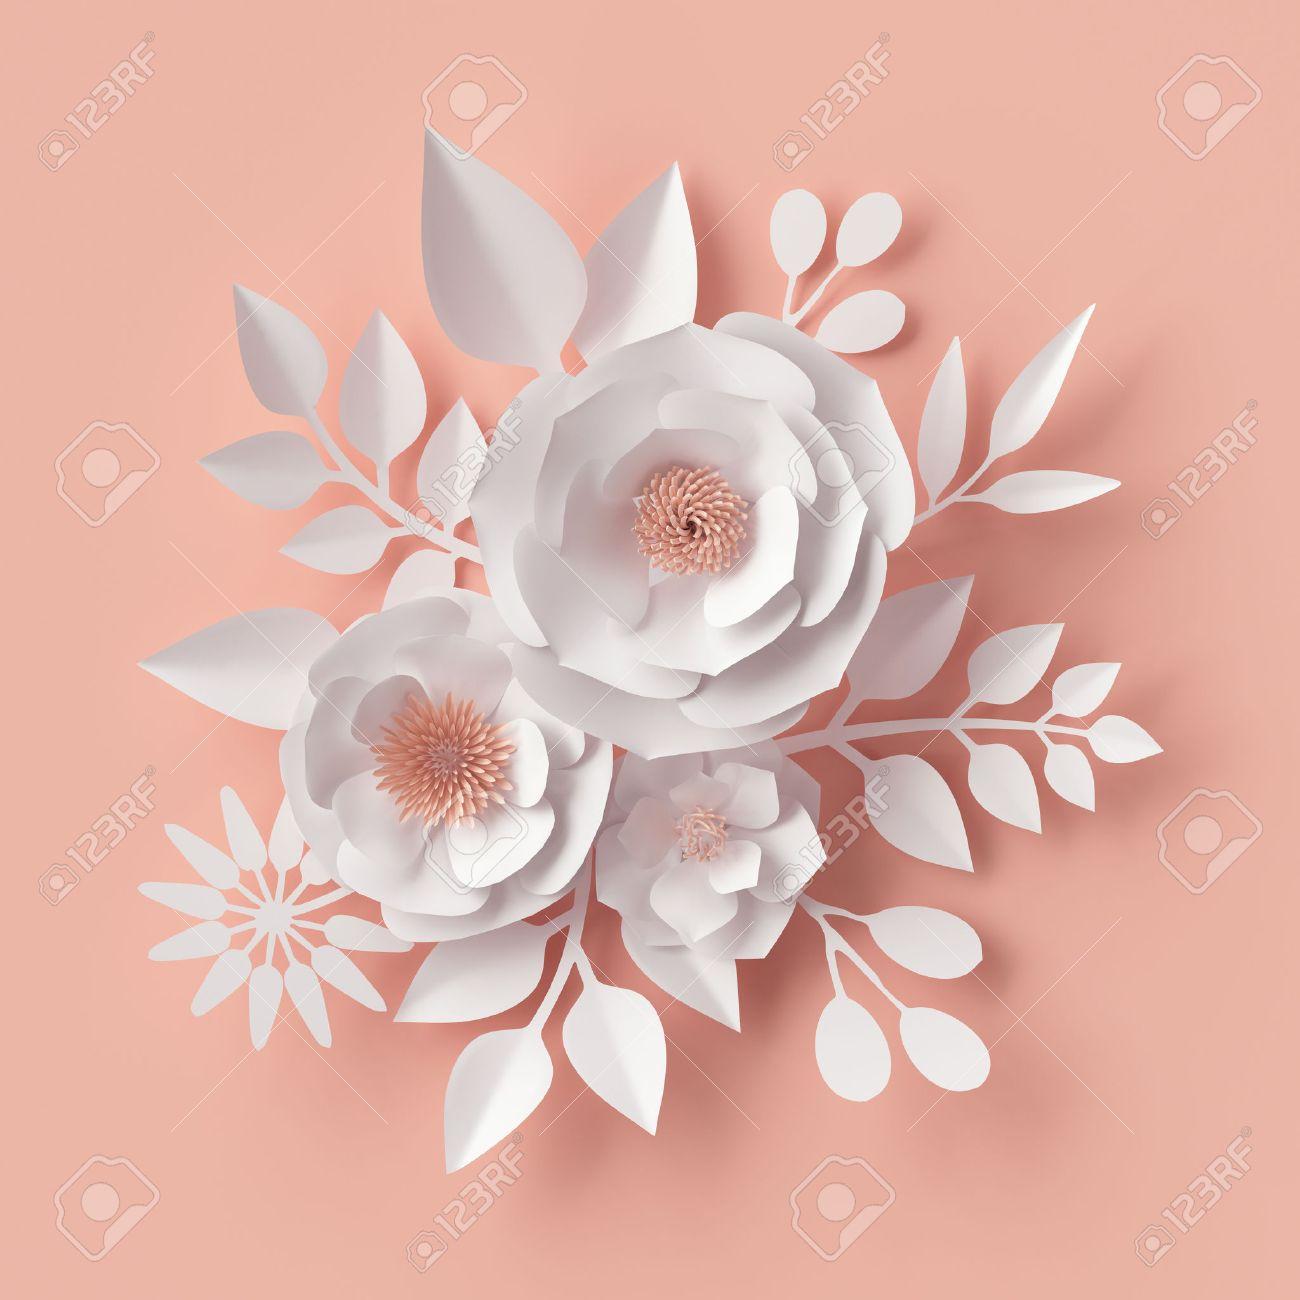 Marvelous 3d Render, Digital Illustration, White Paper Flowers, Blush Pink Wall Decor,  Floral